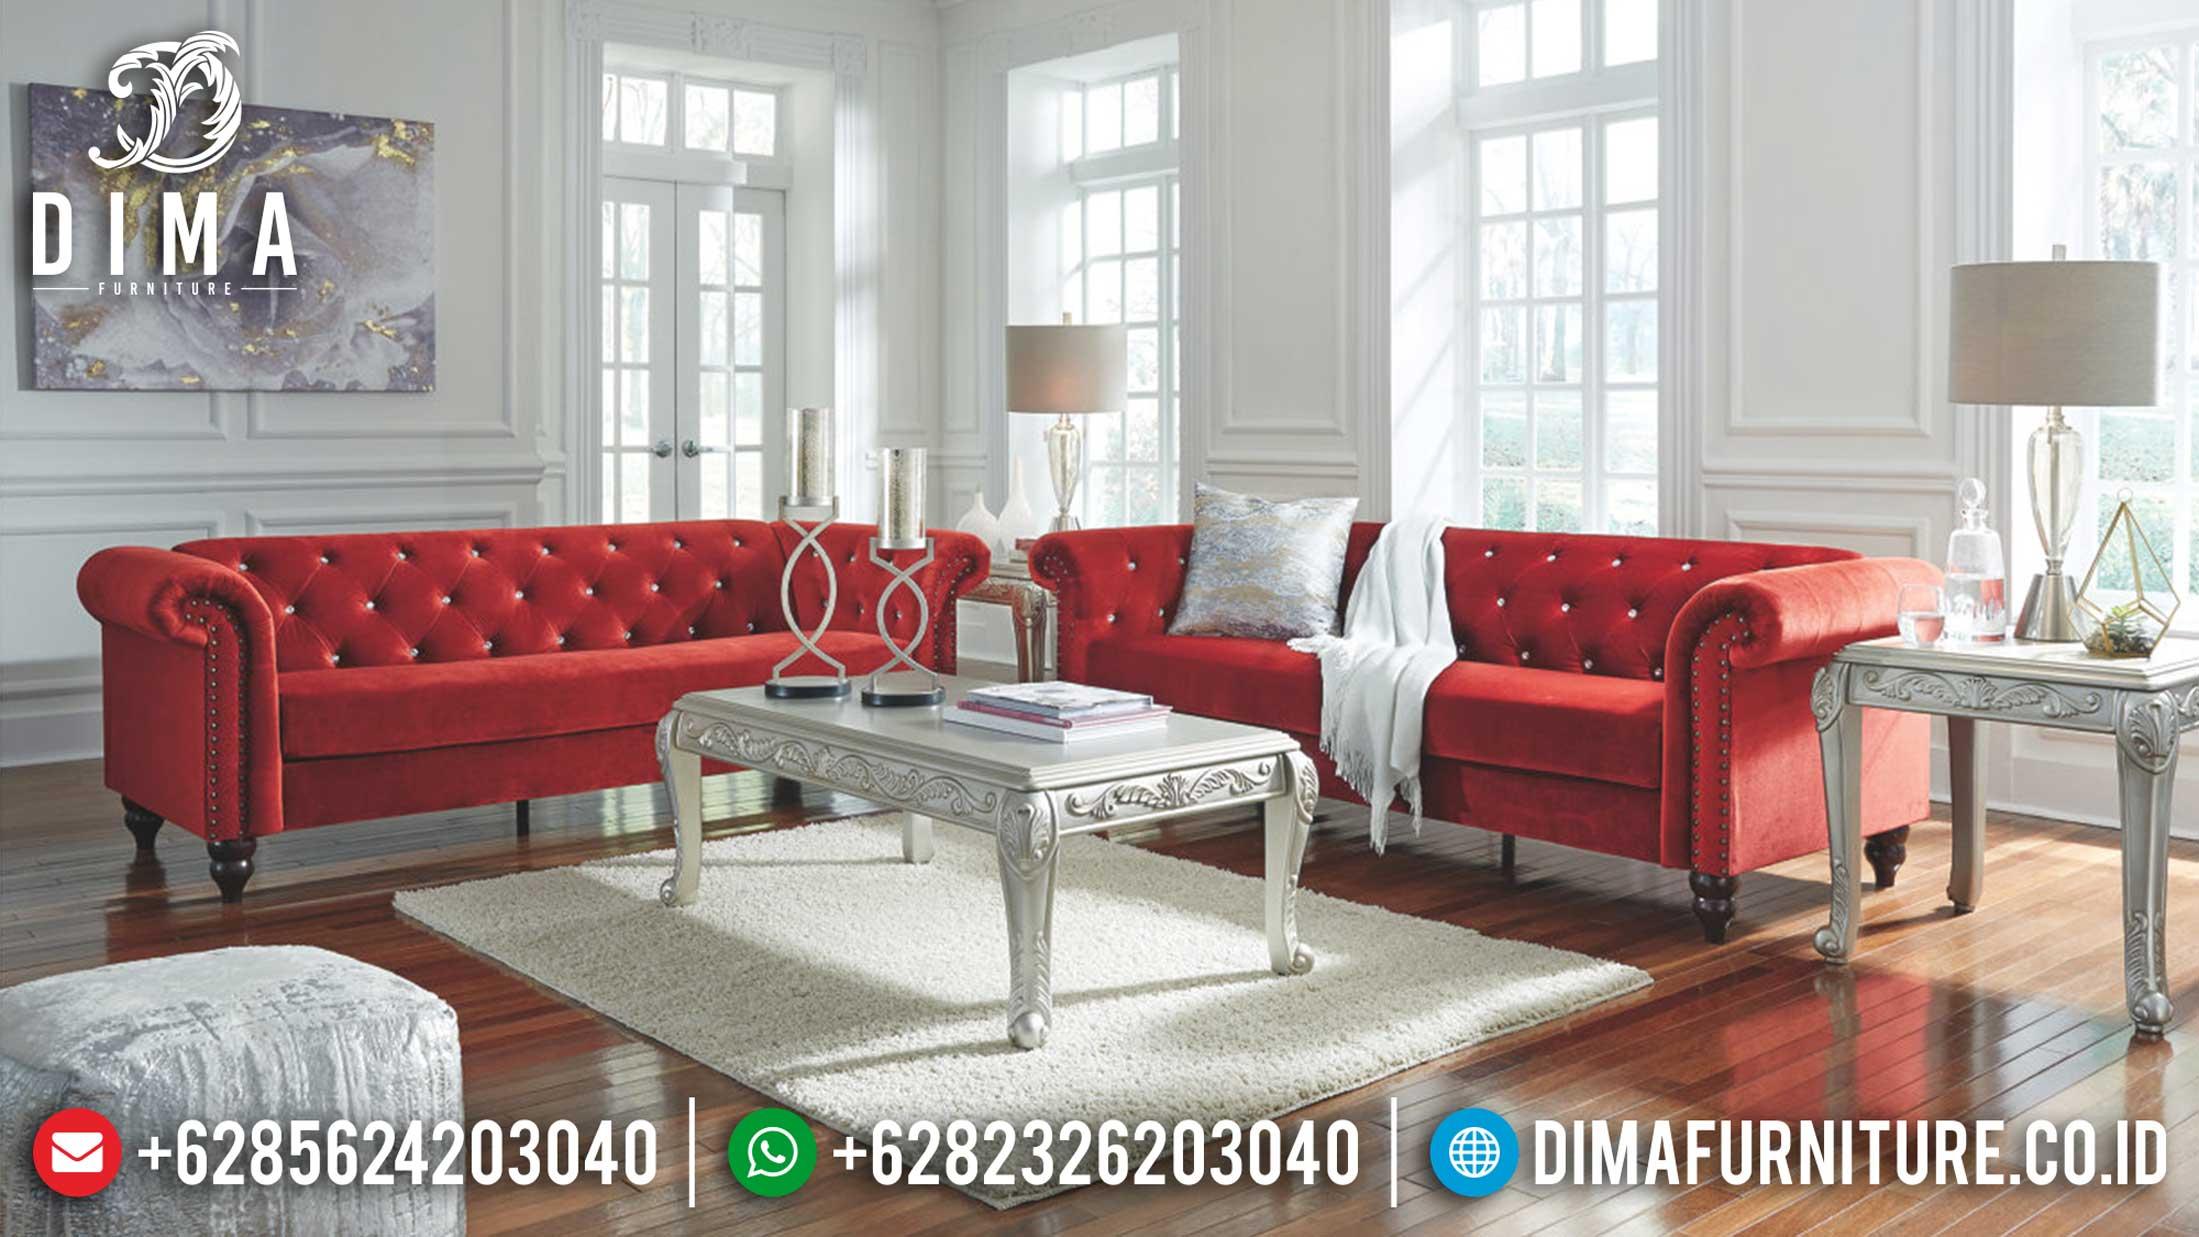 Loveset Sofa Tamu Chesterfield Minimalis Modern Red Heart Beauty Color TTJ-1220